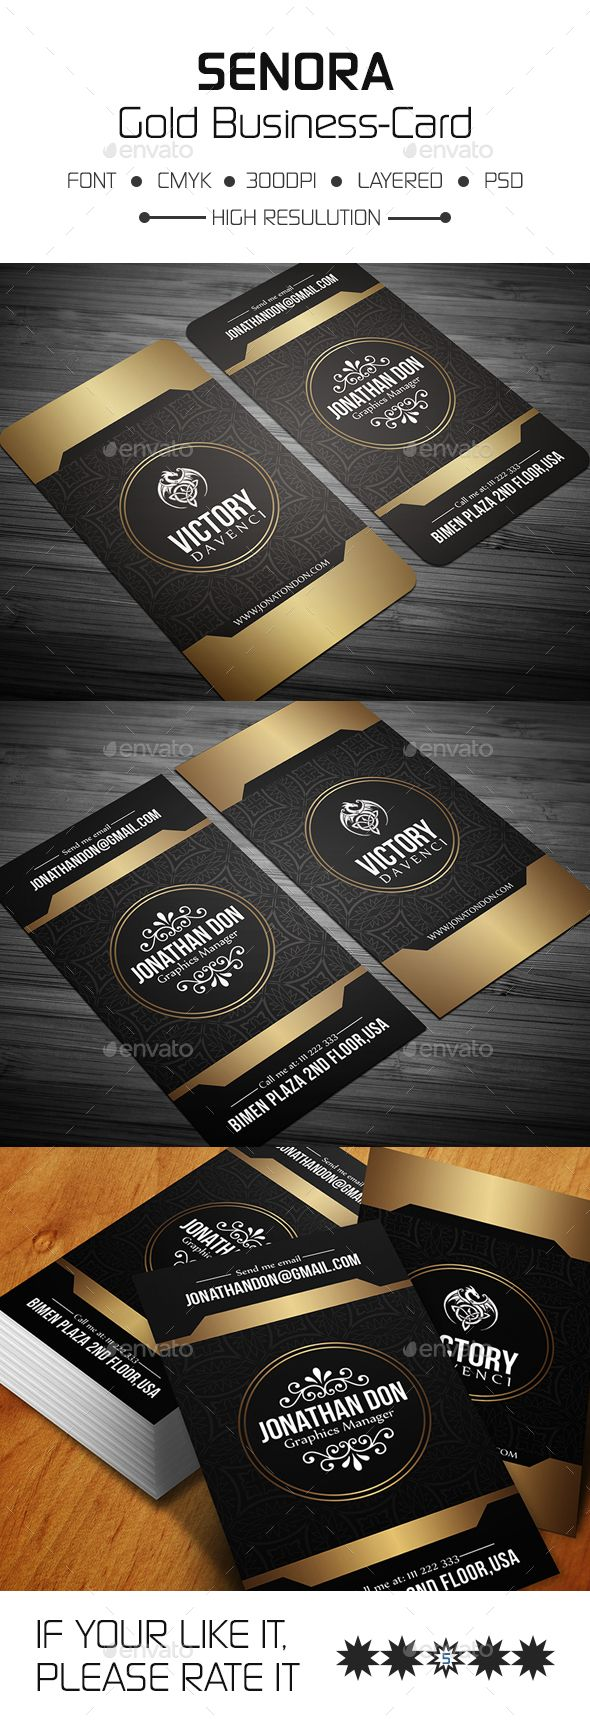 Senora Gold Business Card — Photoshop PSD #stylish #htmlexplorer • Download ➝ https://graphicriver.net/item/senora-gold-business-card/17747569?ref=pxcr